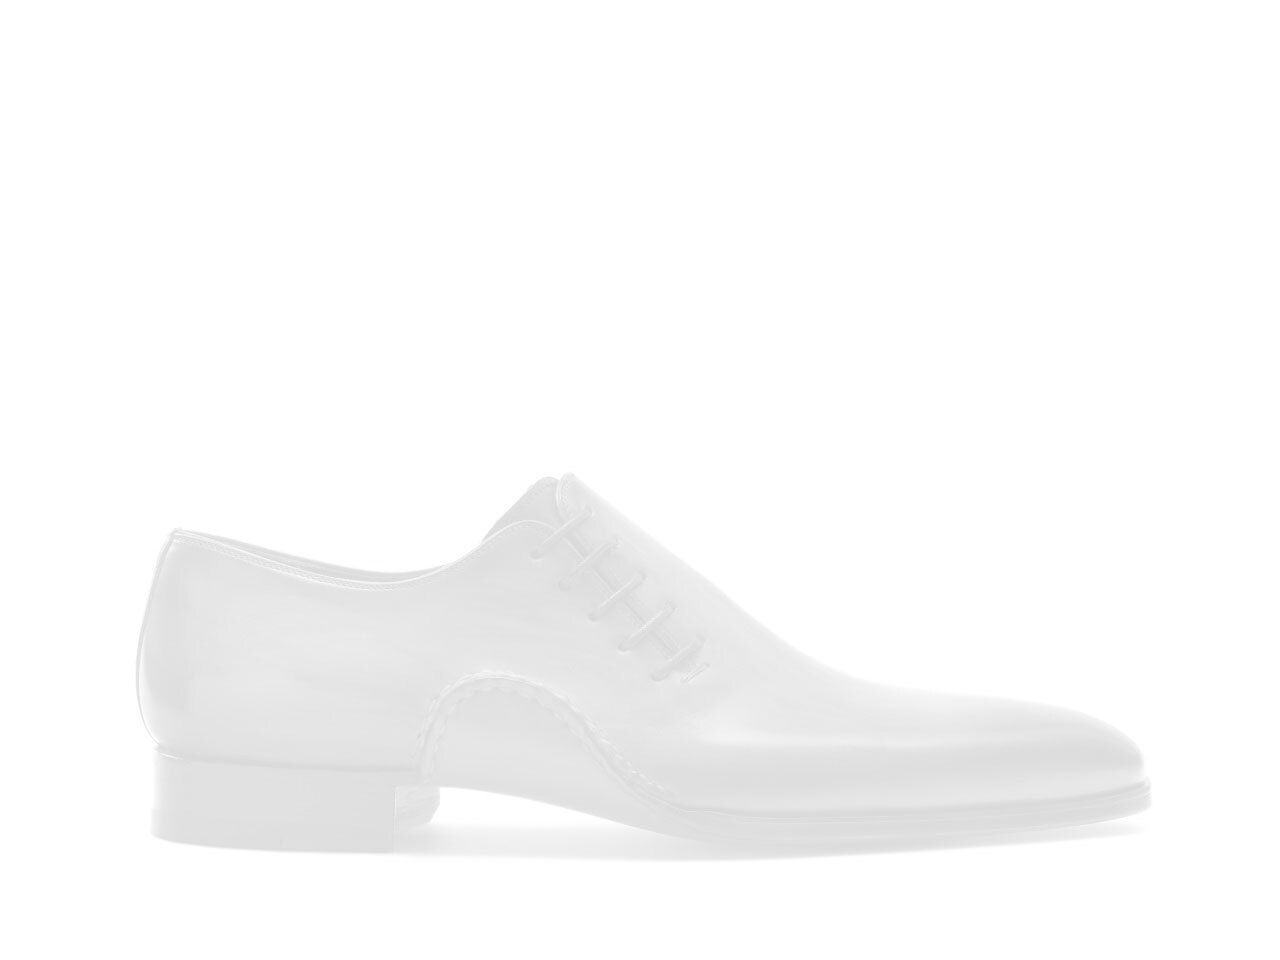 Pair of the Magnanni Efren Black Men's Single Monk Strap Shoes